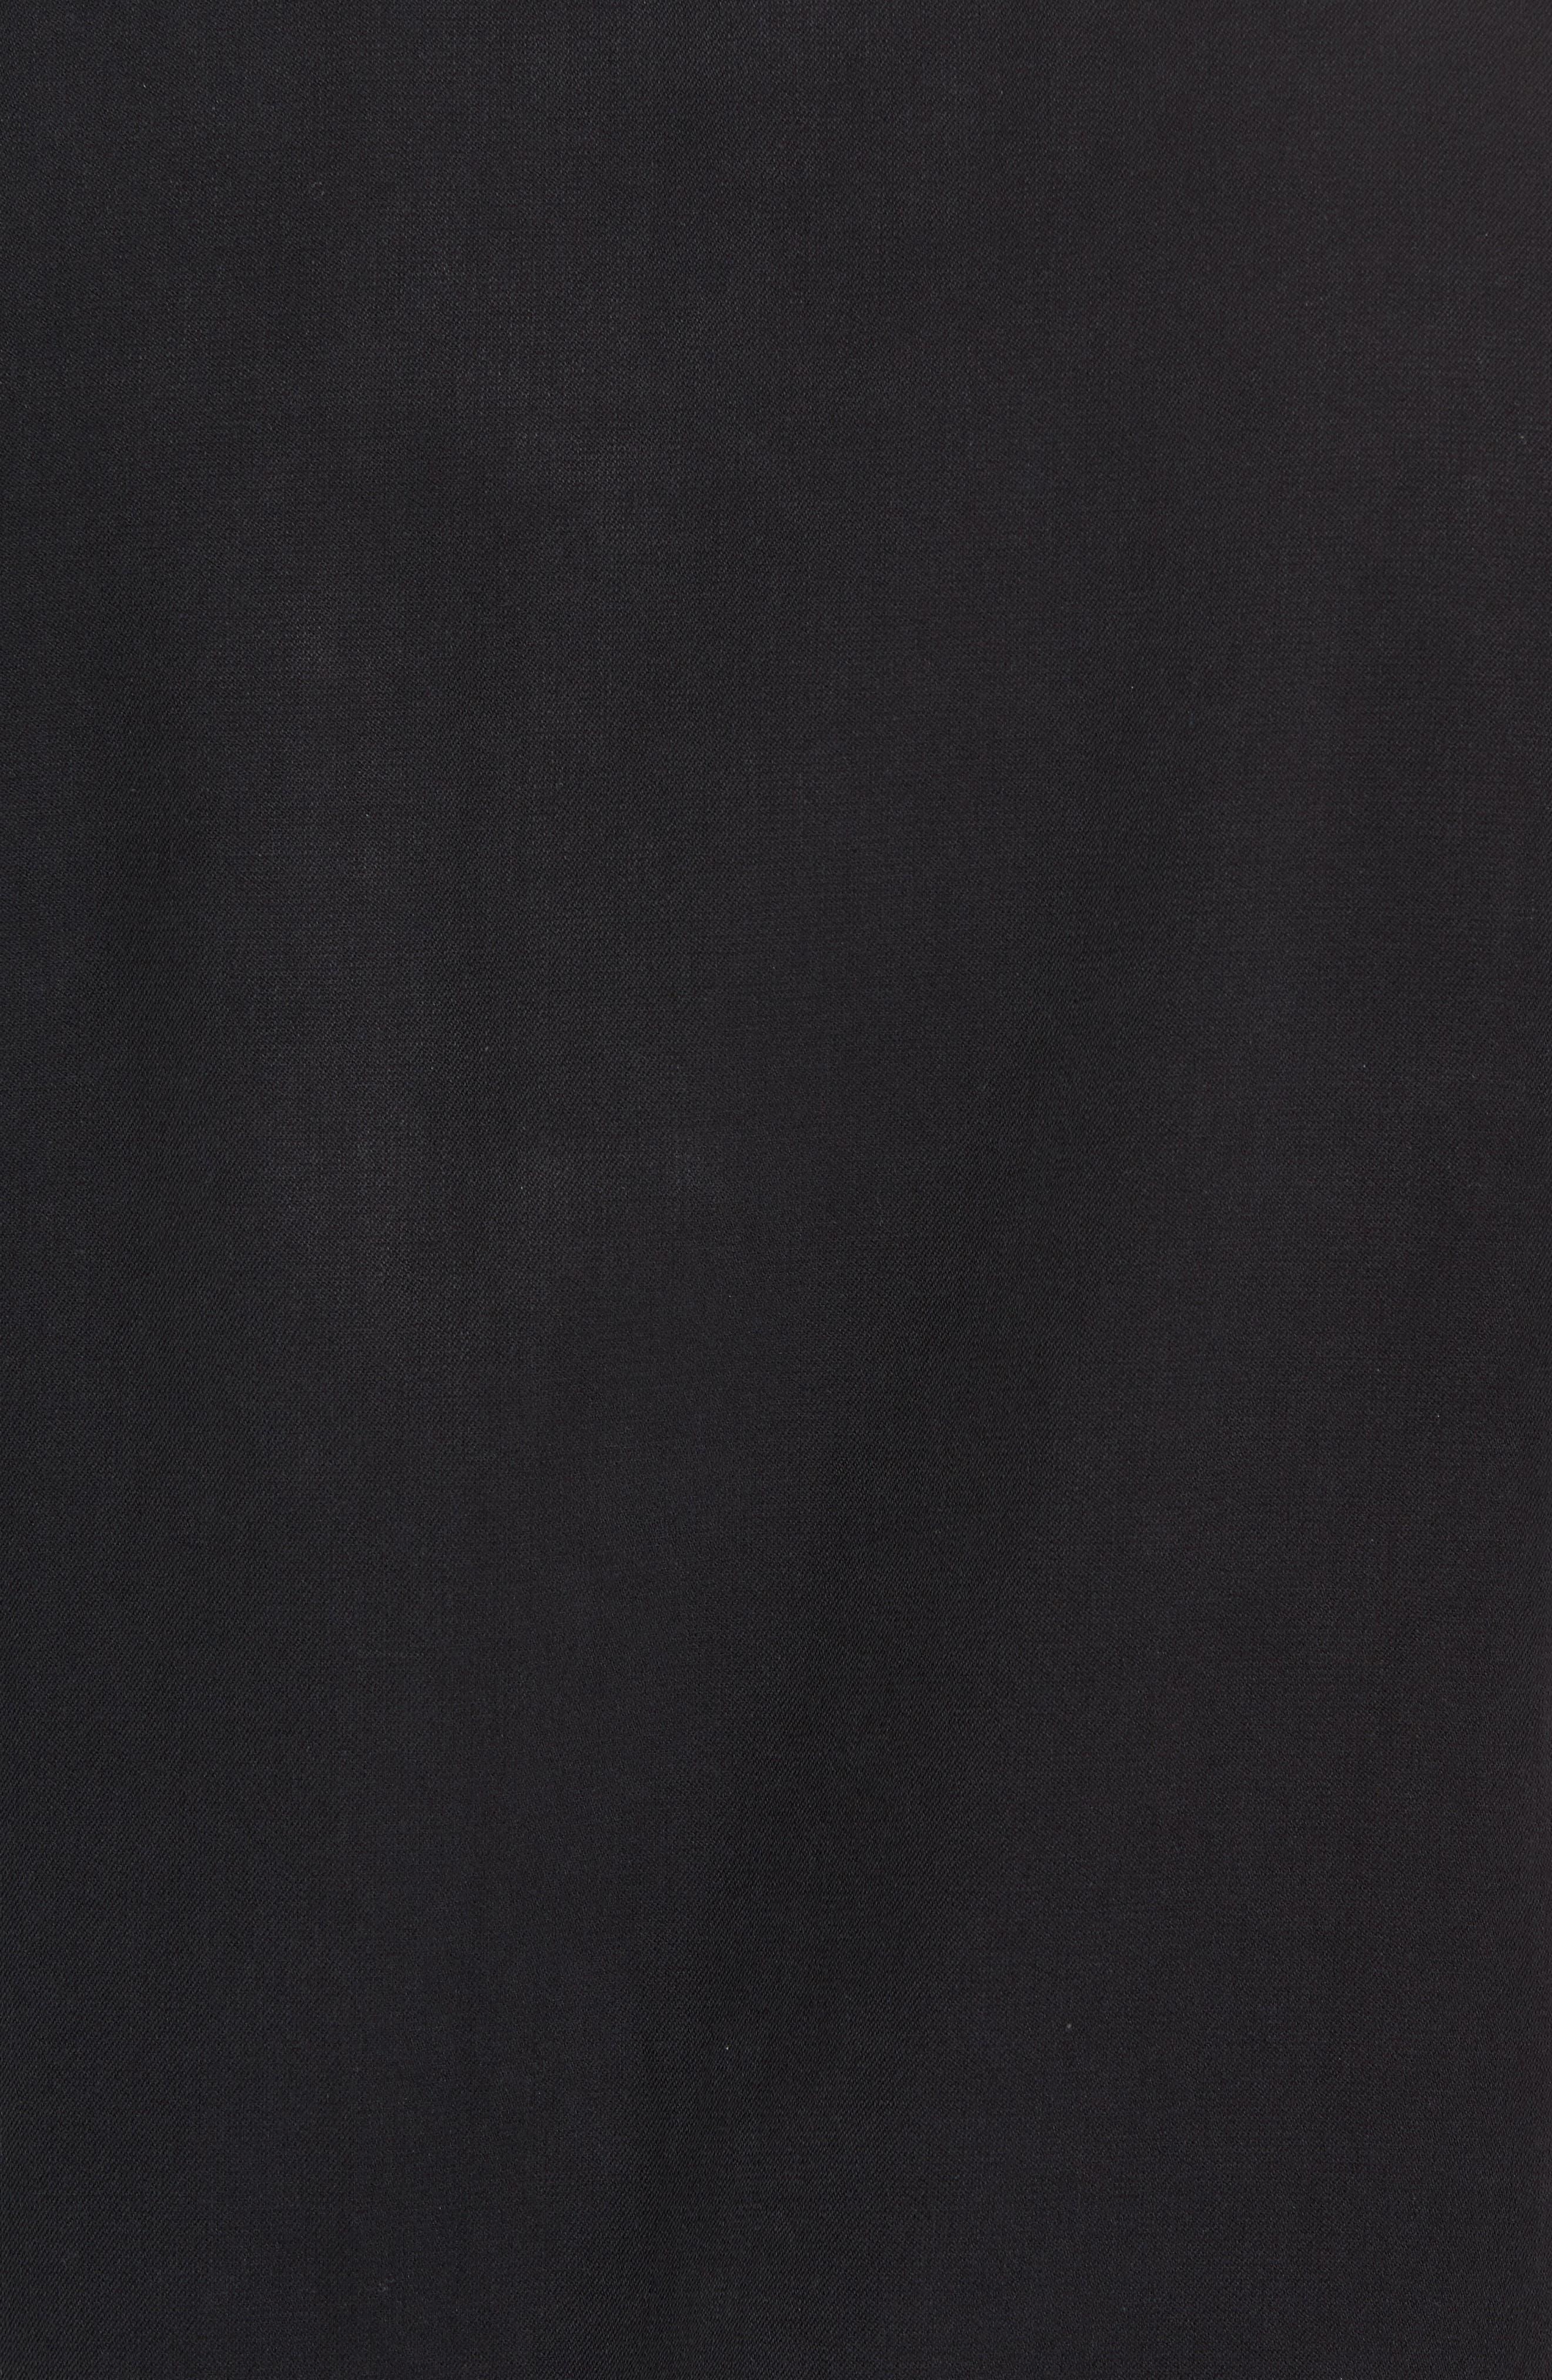 Black Diamond Regular Fit Embroidered Silk Blend Sport Shirt,                             Alternate thumbnail 5, color,                             001